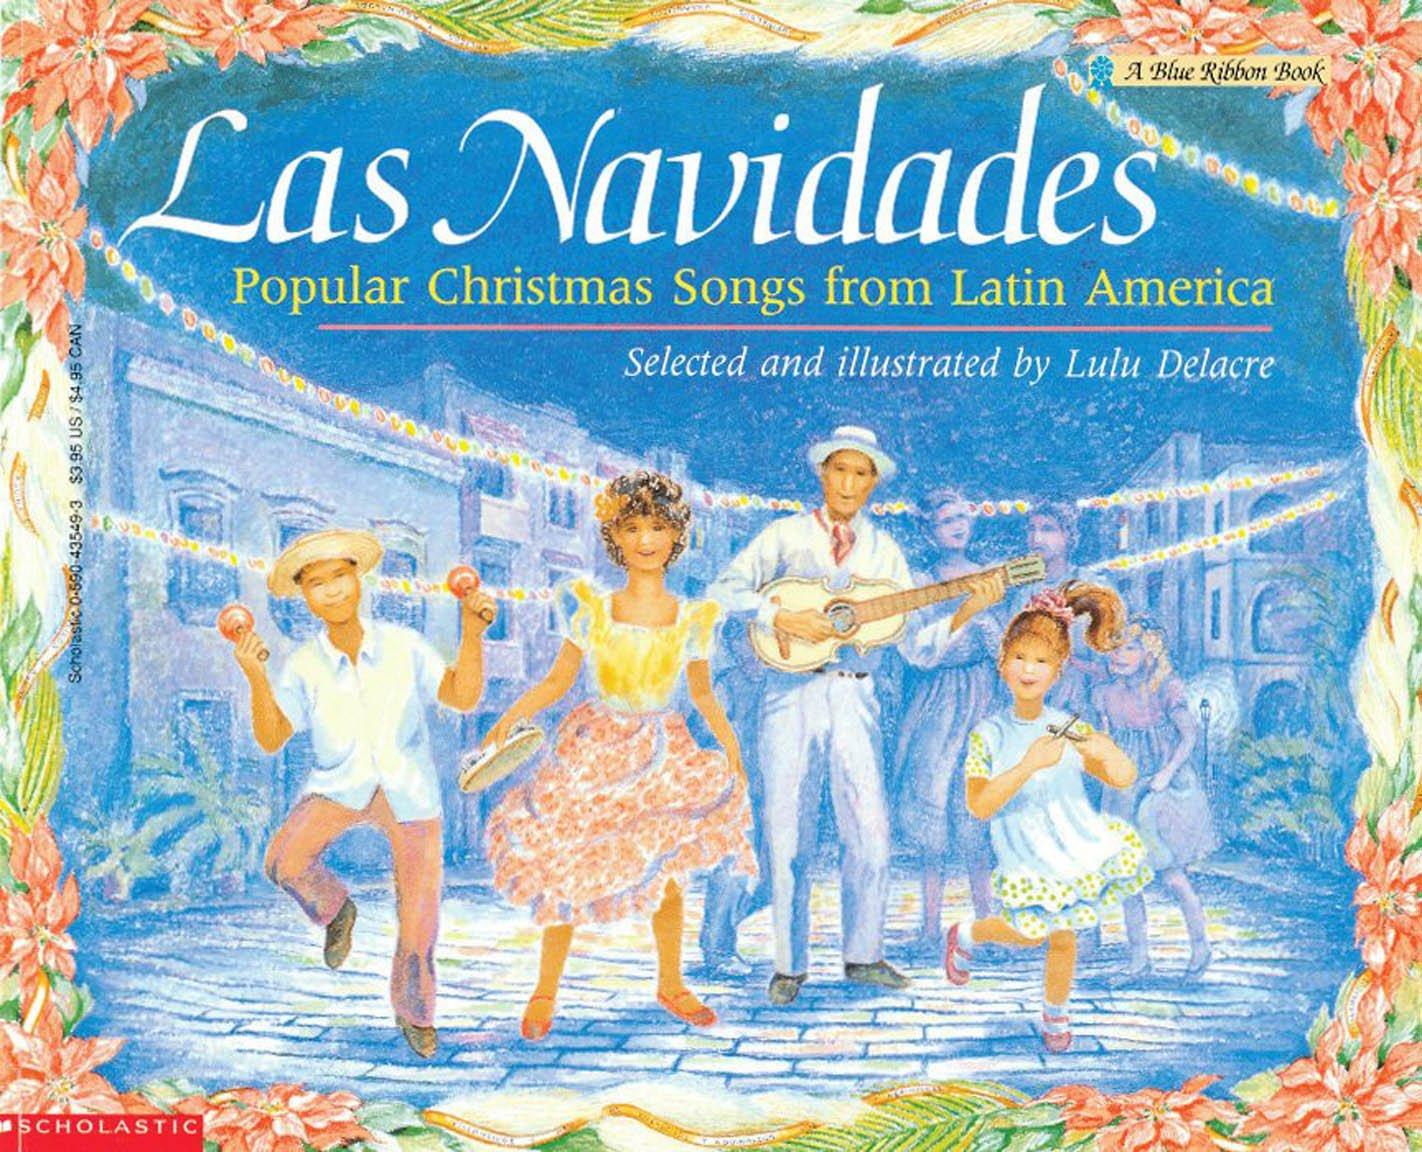 Navidades Popular Songs Latin America product image